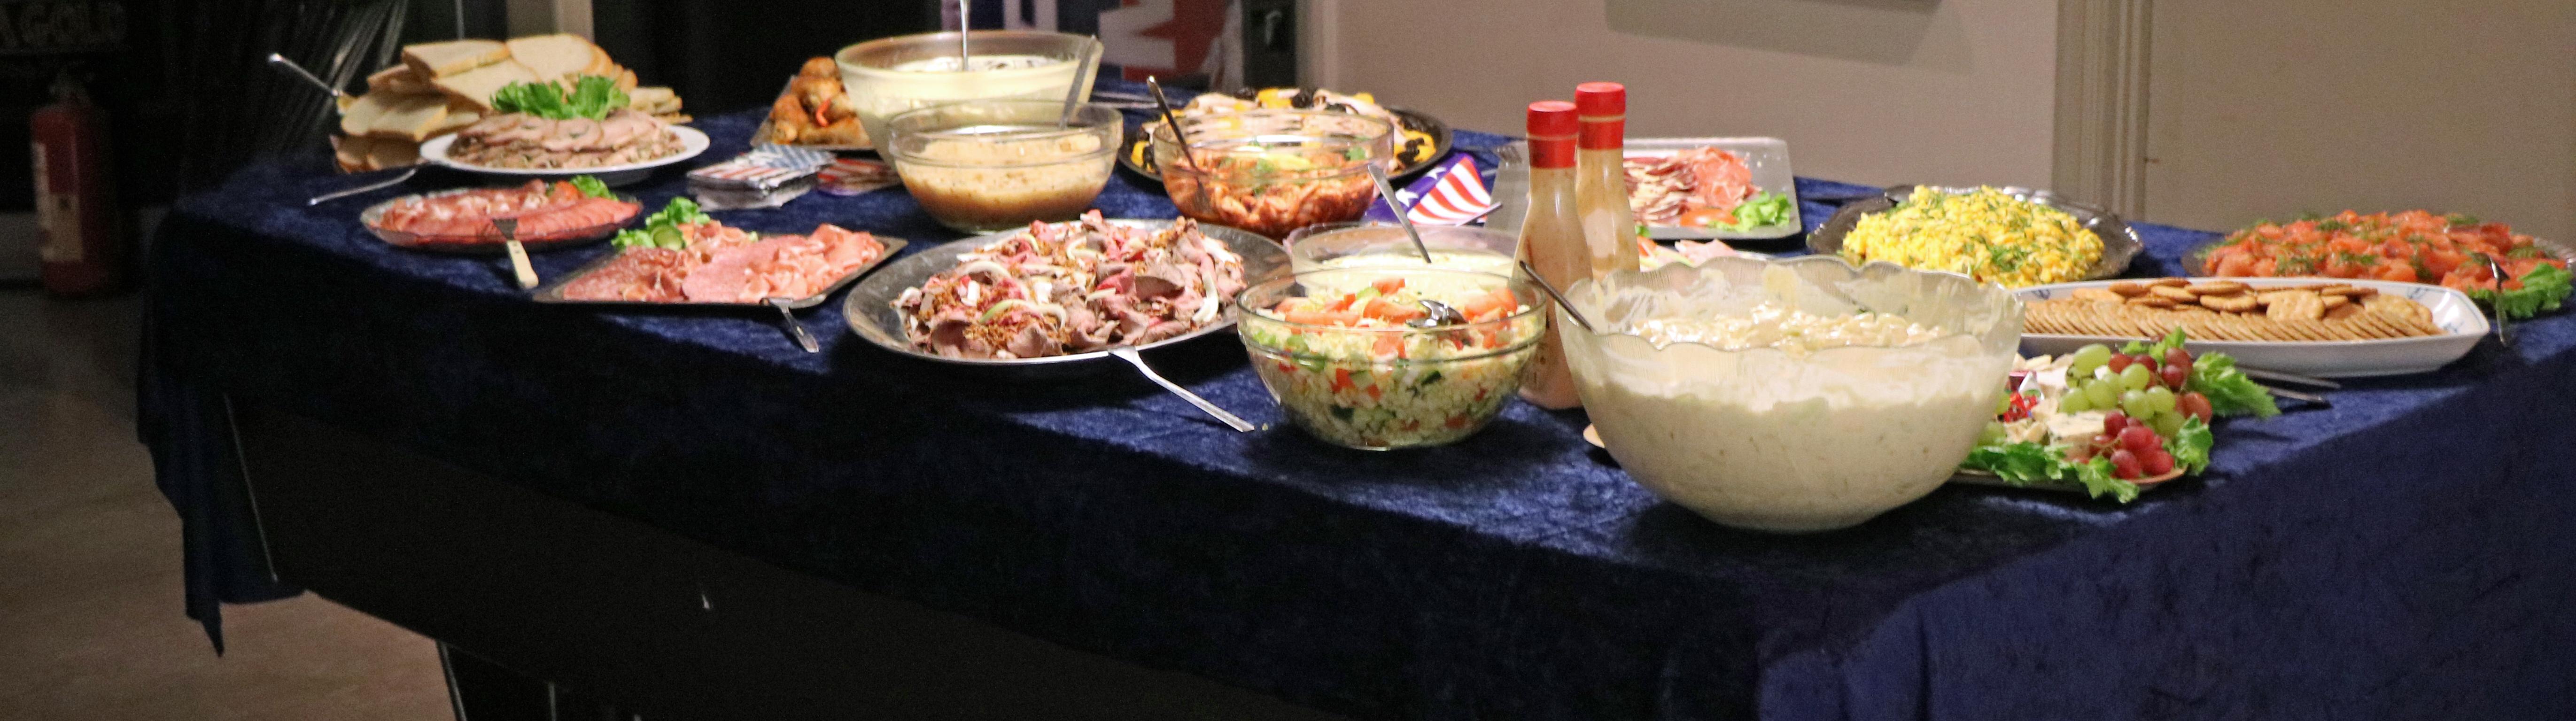 Vellykket jubileumsfest